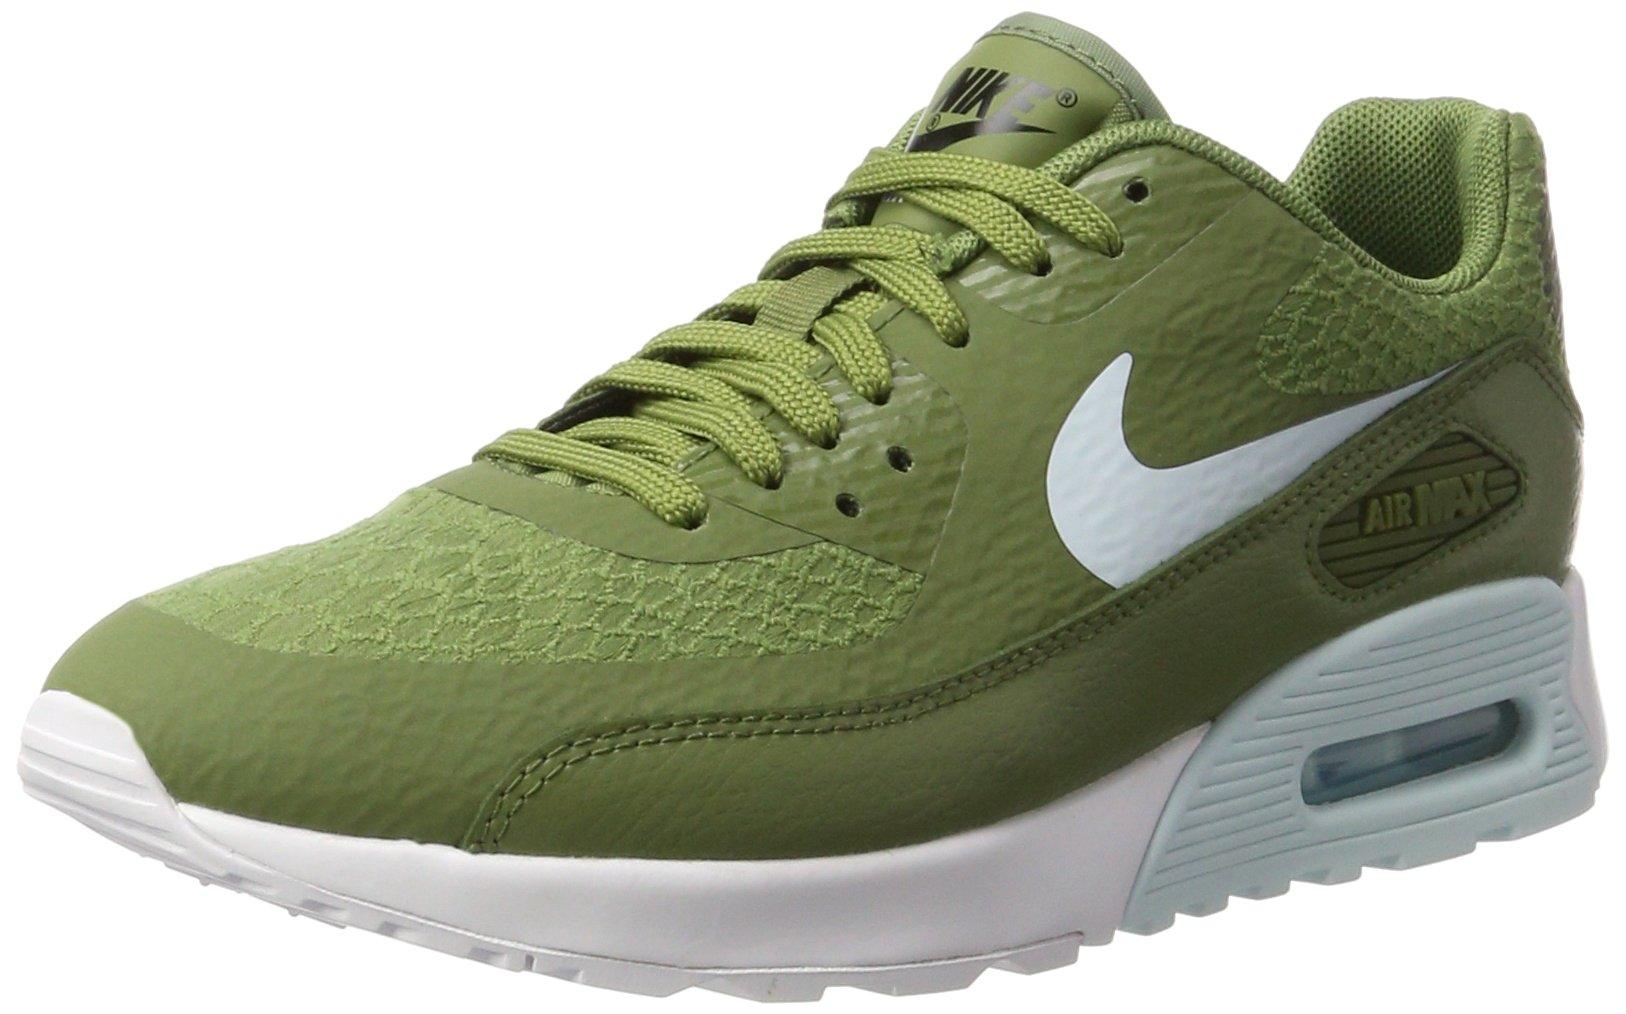 876d2f894fe Galleon - Nike Women s Air Max 90 Ultra 2.0